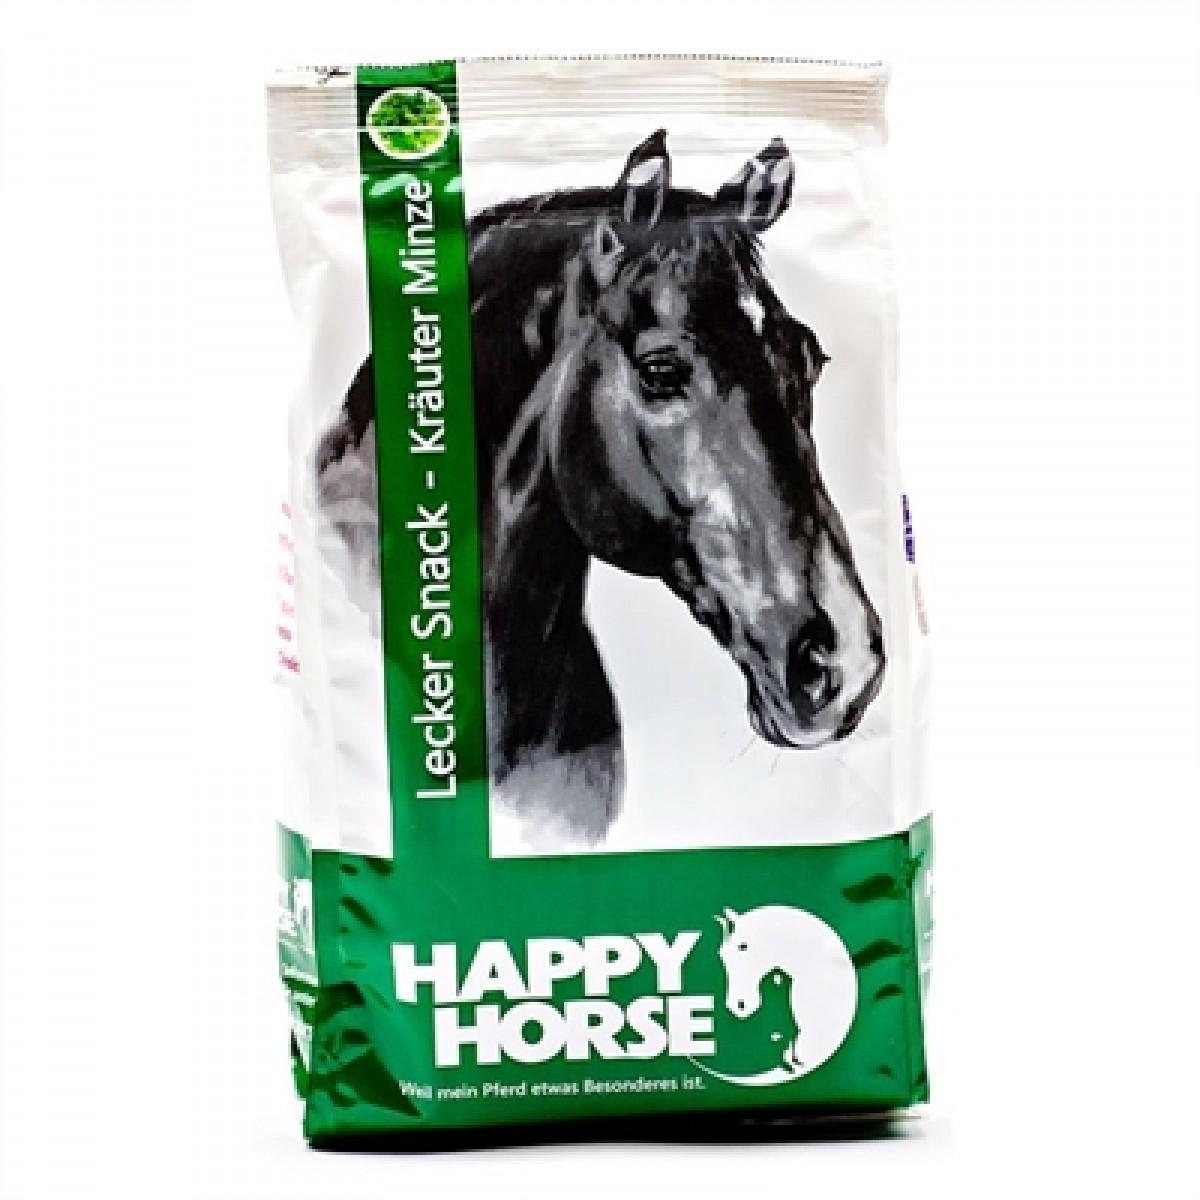 Happy Horse urter/mint